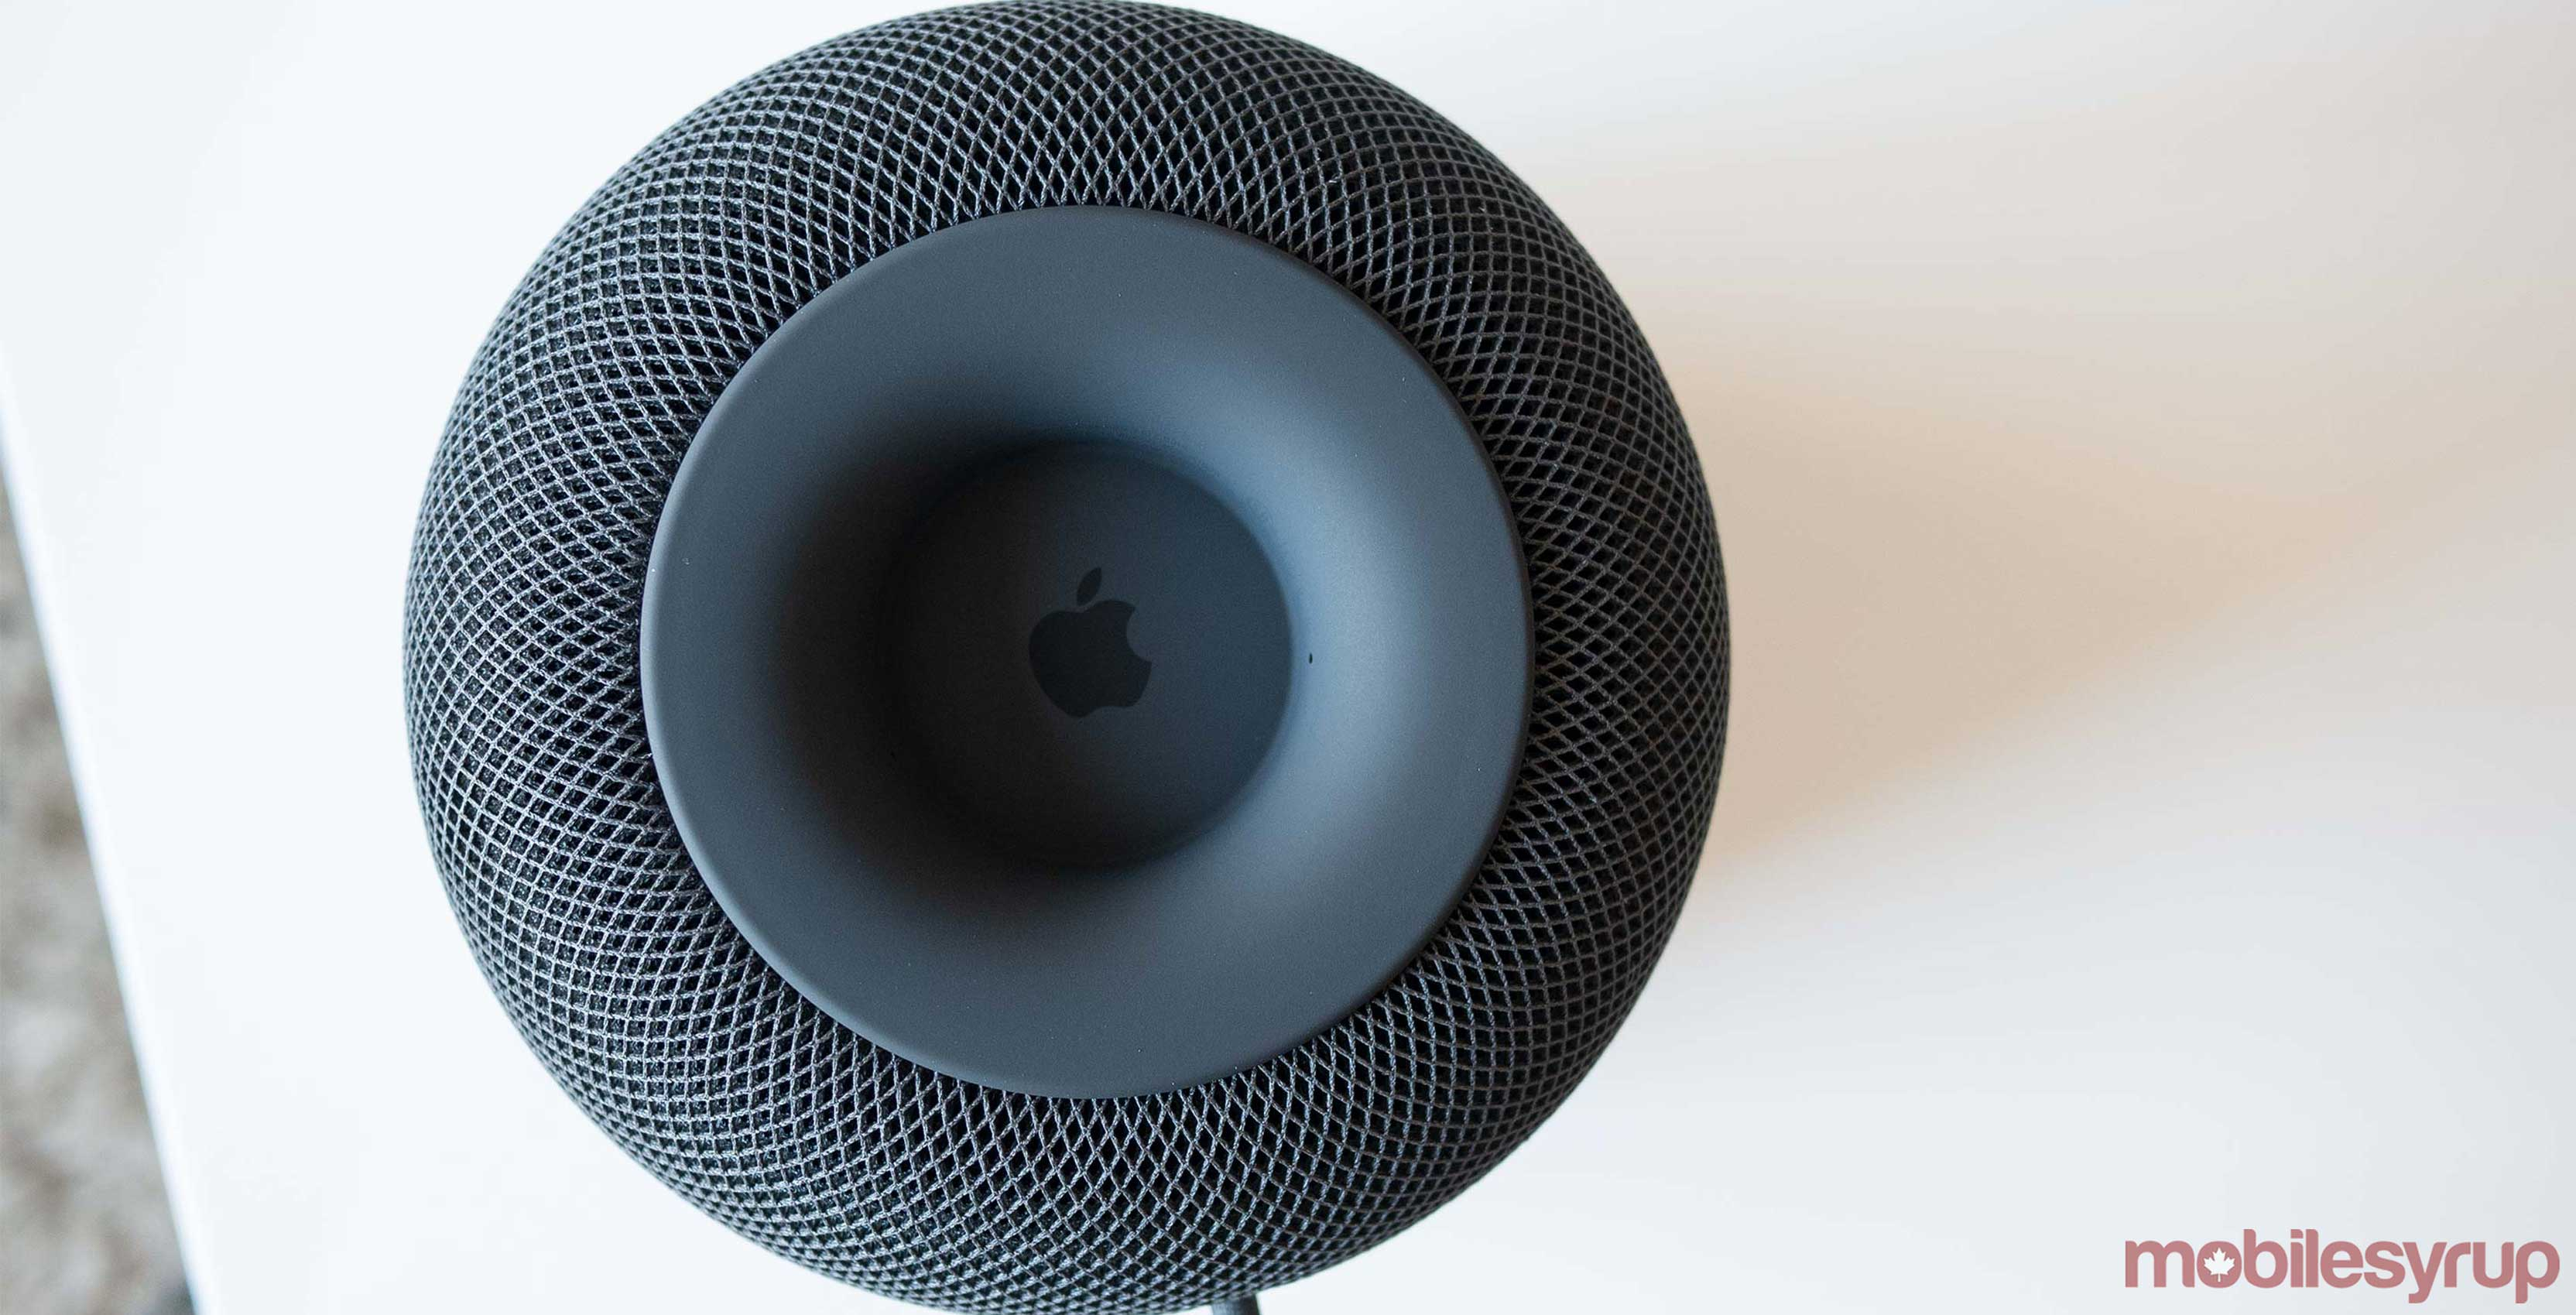 Underside of Apple's HomePod